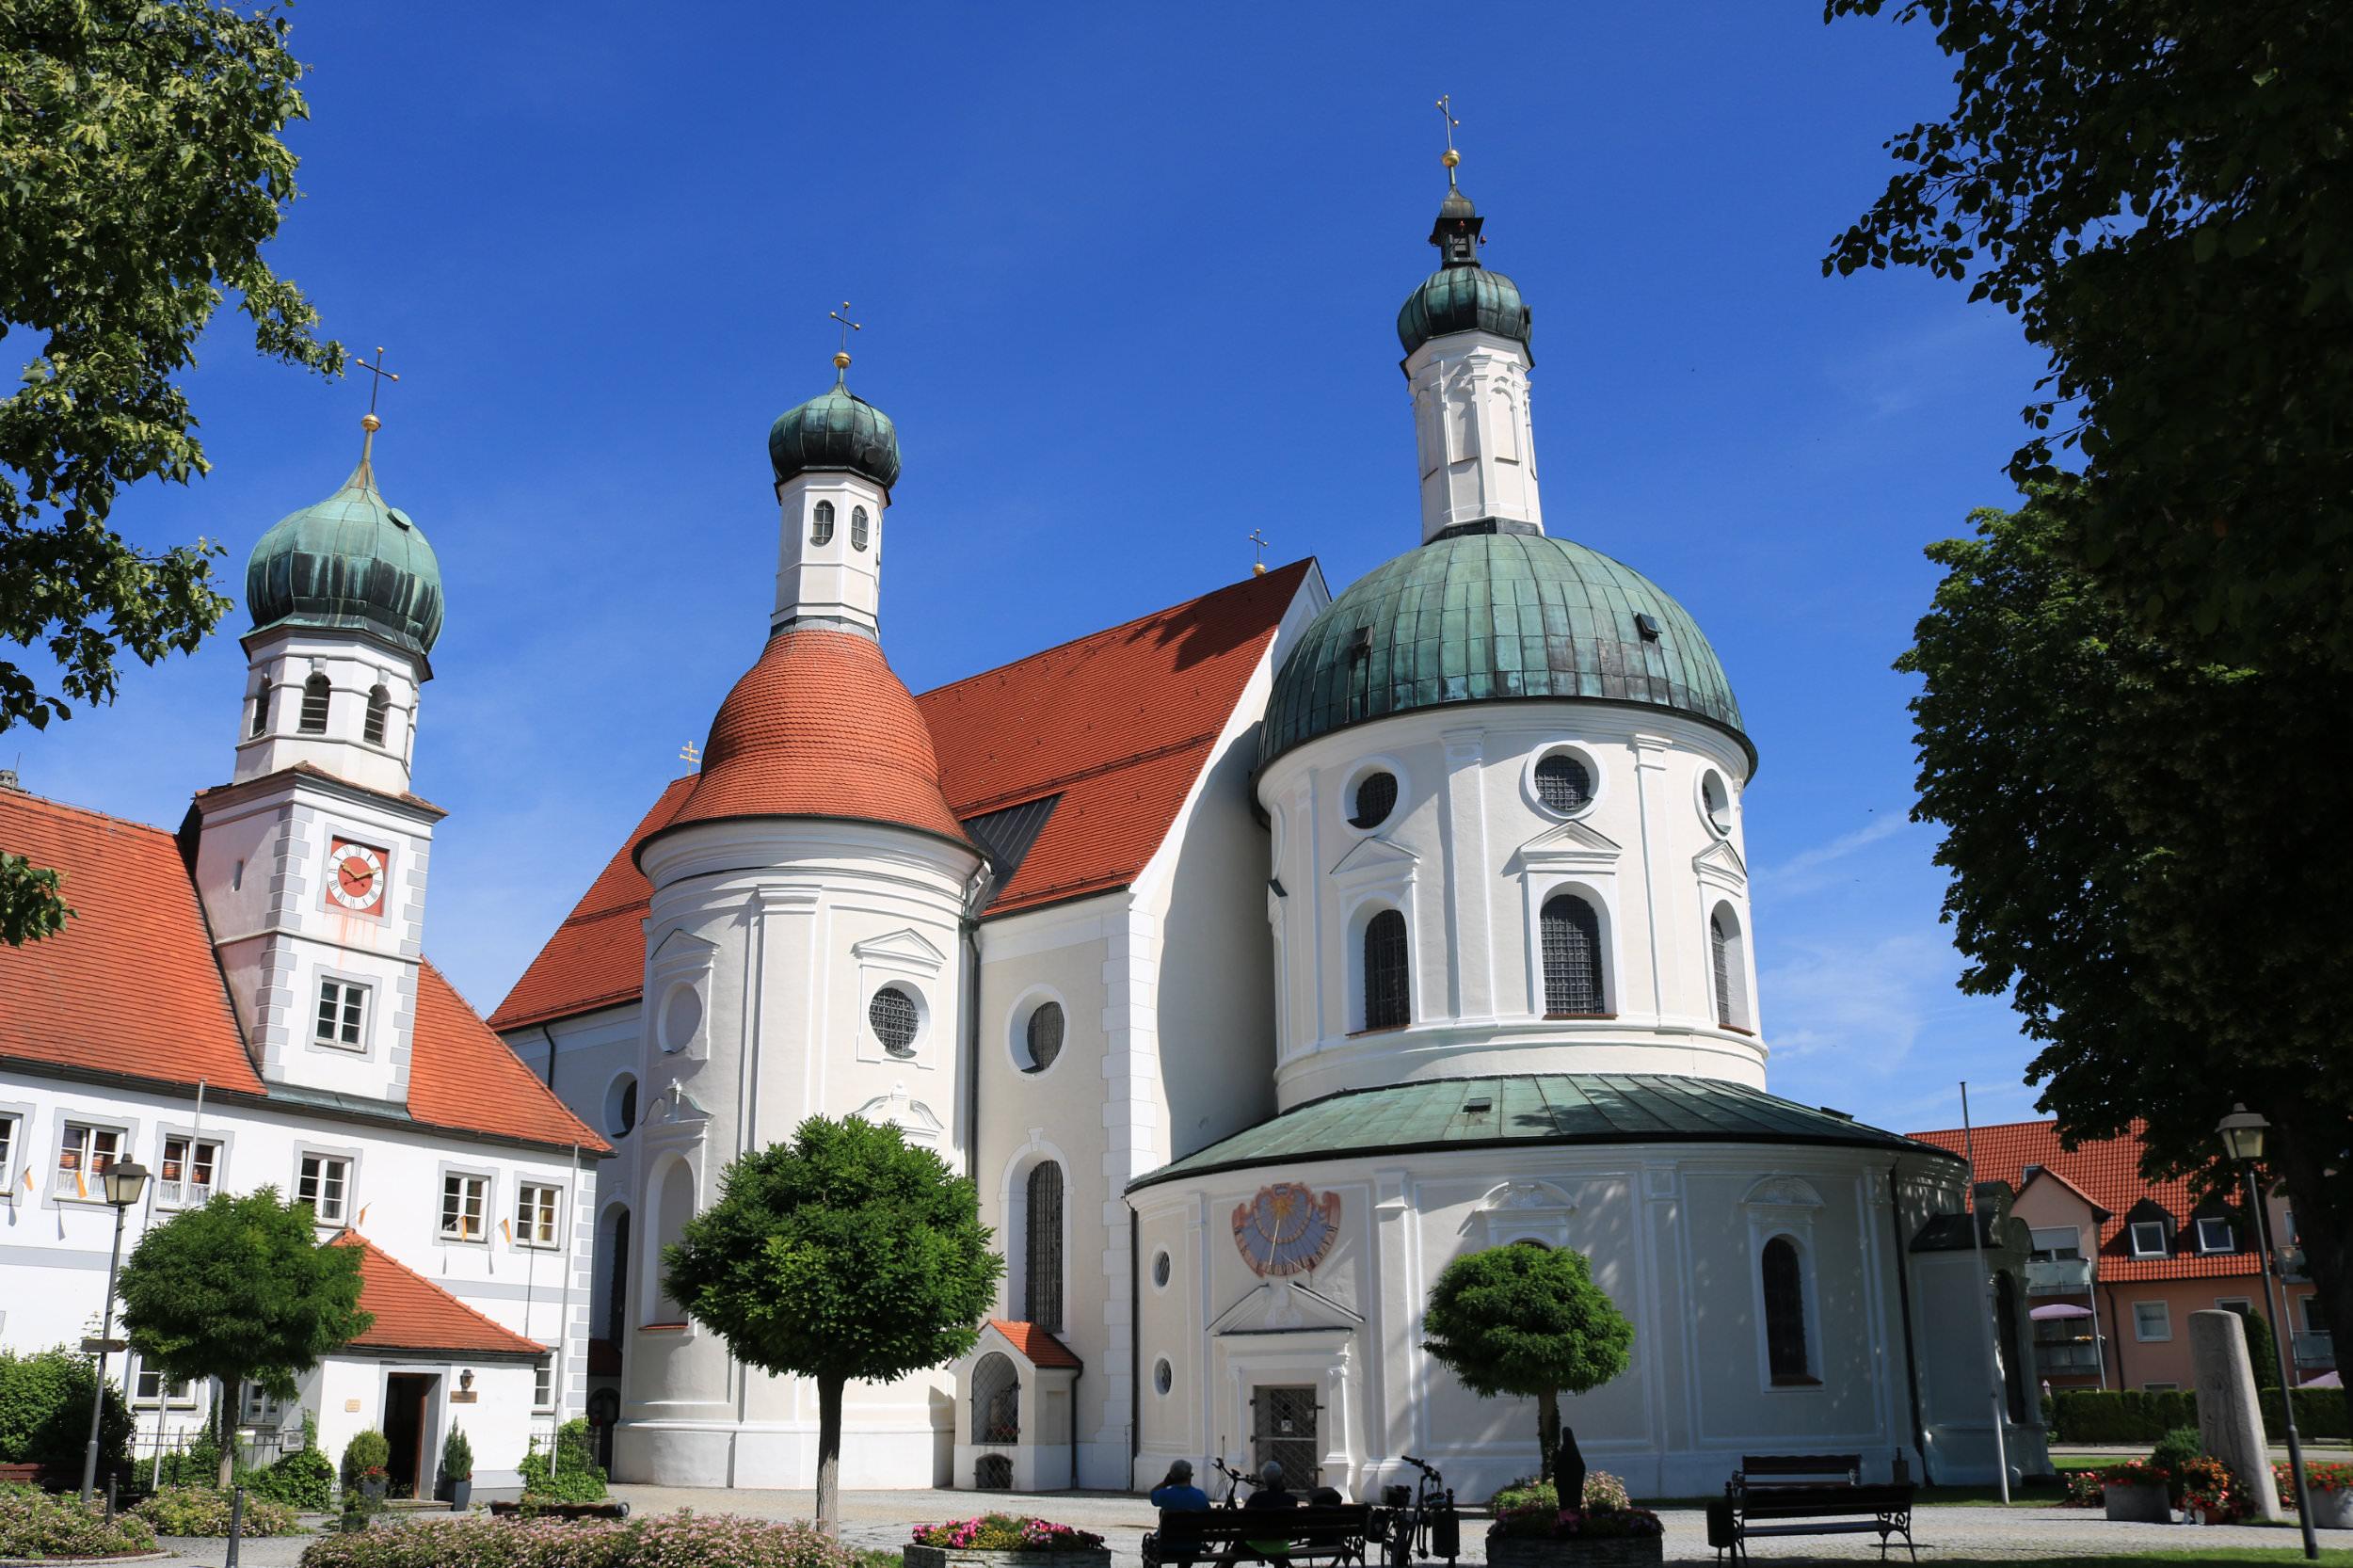 Wallfahrtskirche Klosterlechfeld